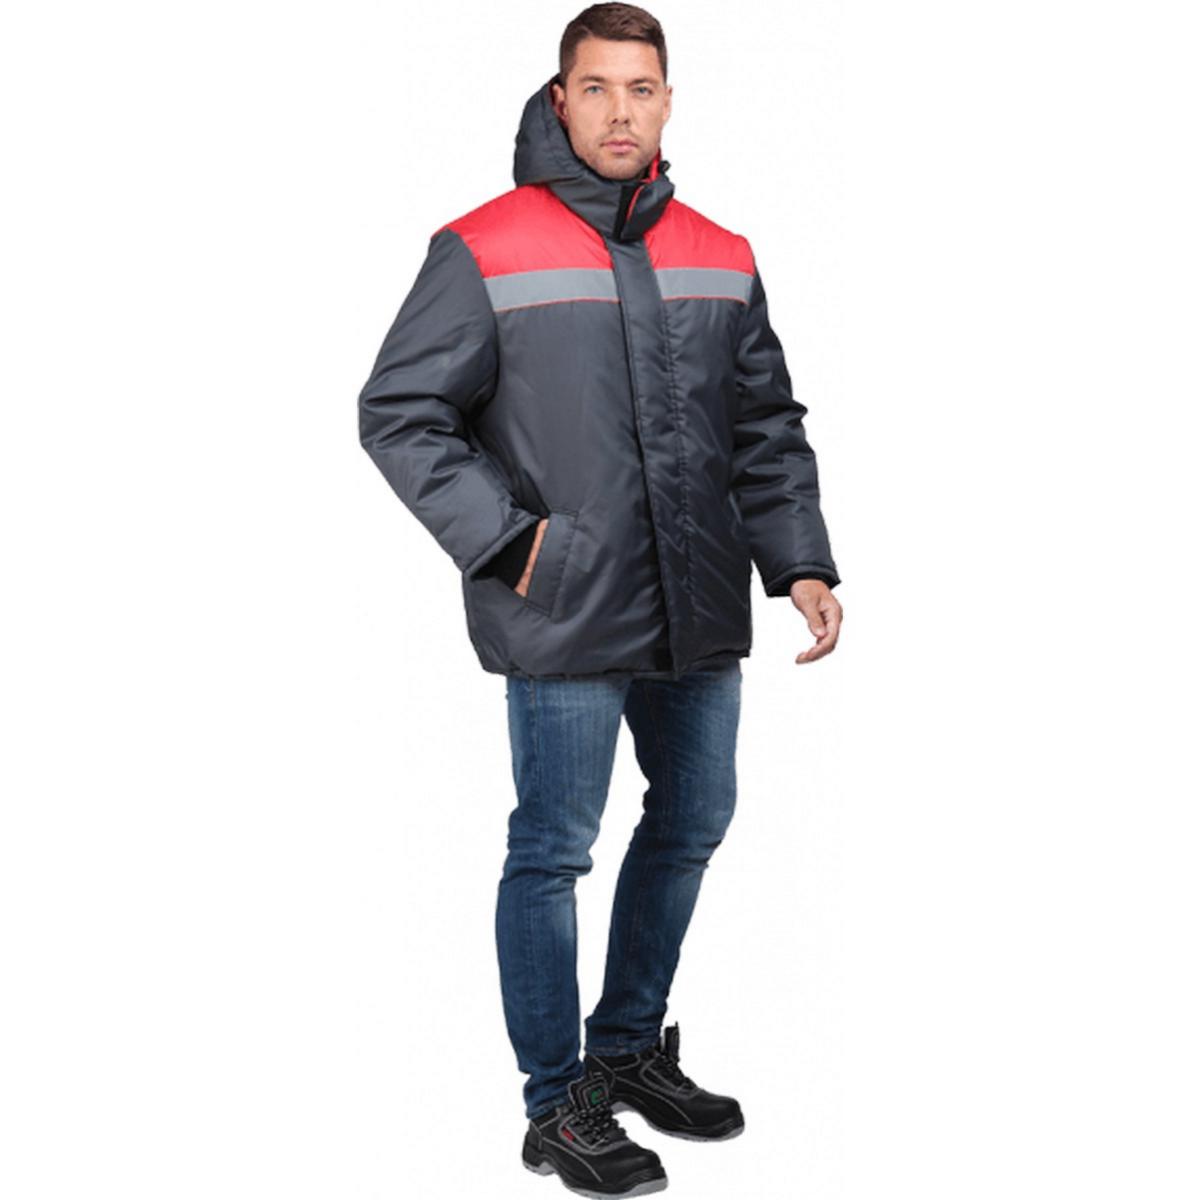 Куртка РАЙТ утепленная т/серый-красный (разм. 88-92 рост 170-176)